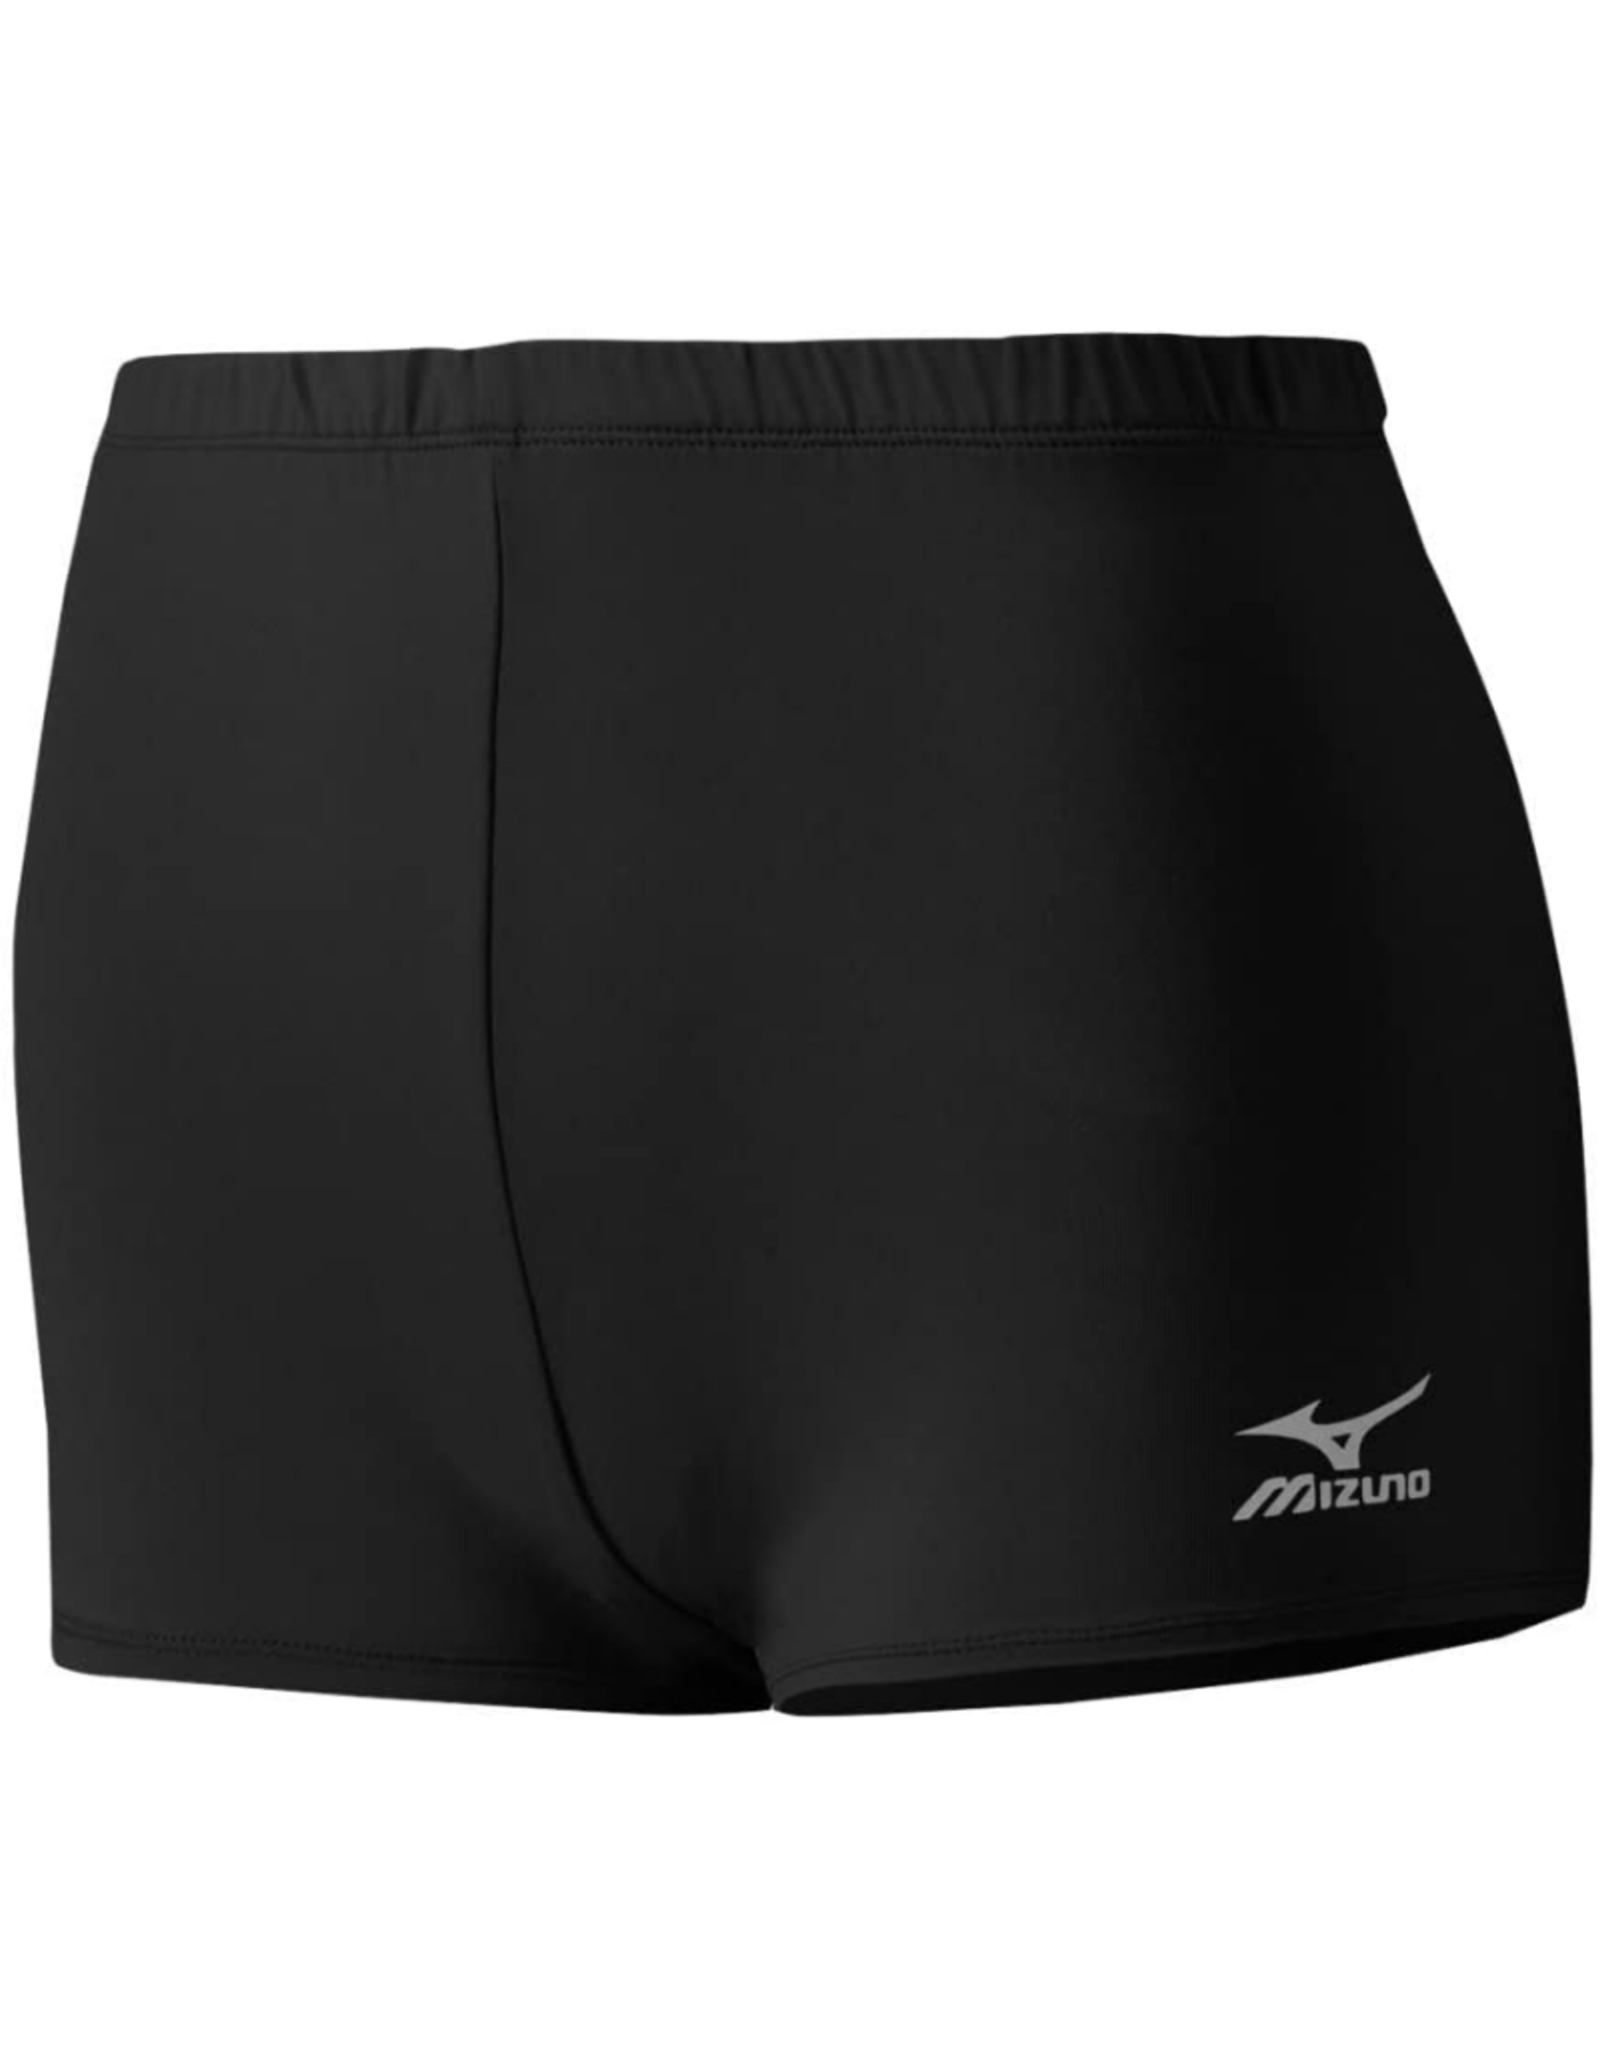 "Mizuno Women's Low Rider Volleyball Short 2.75"" Black"